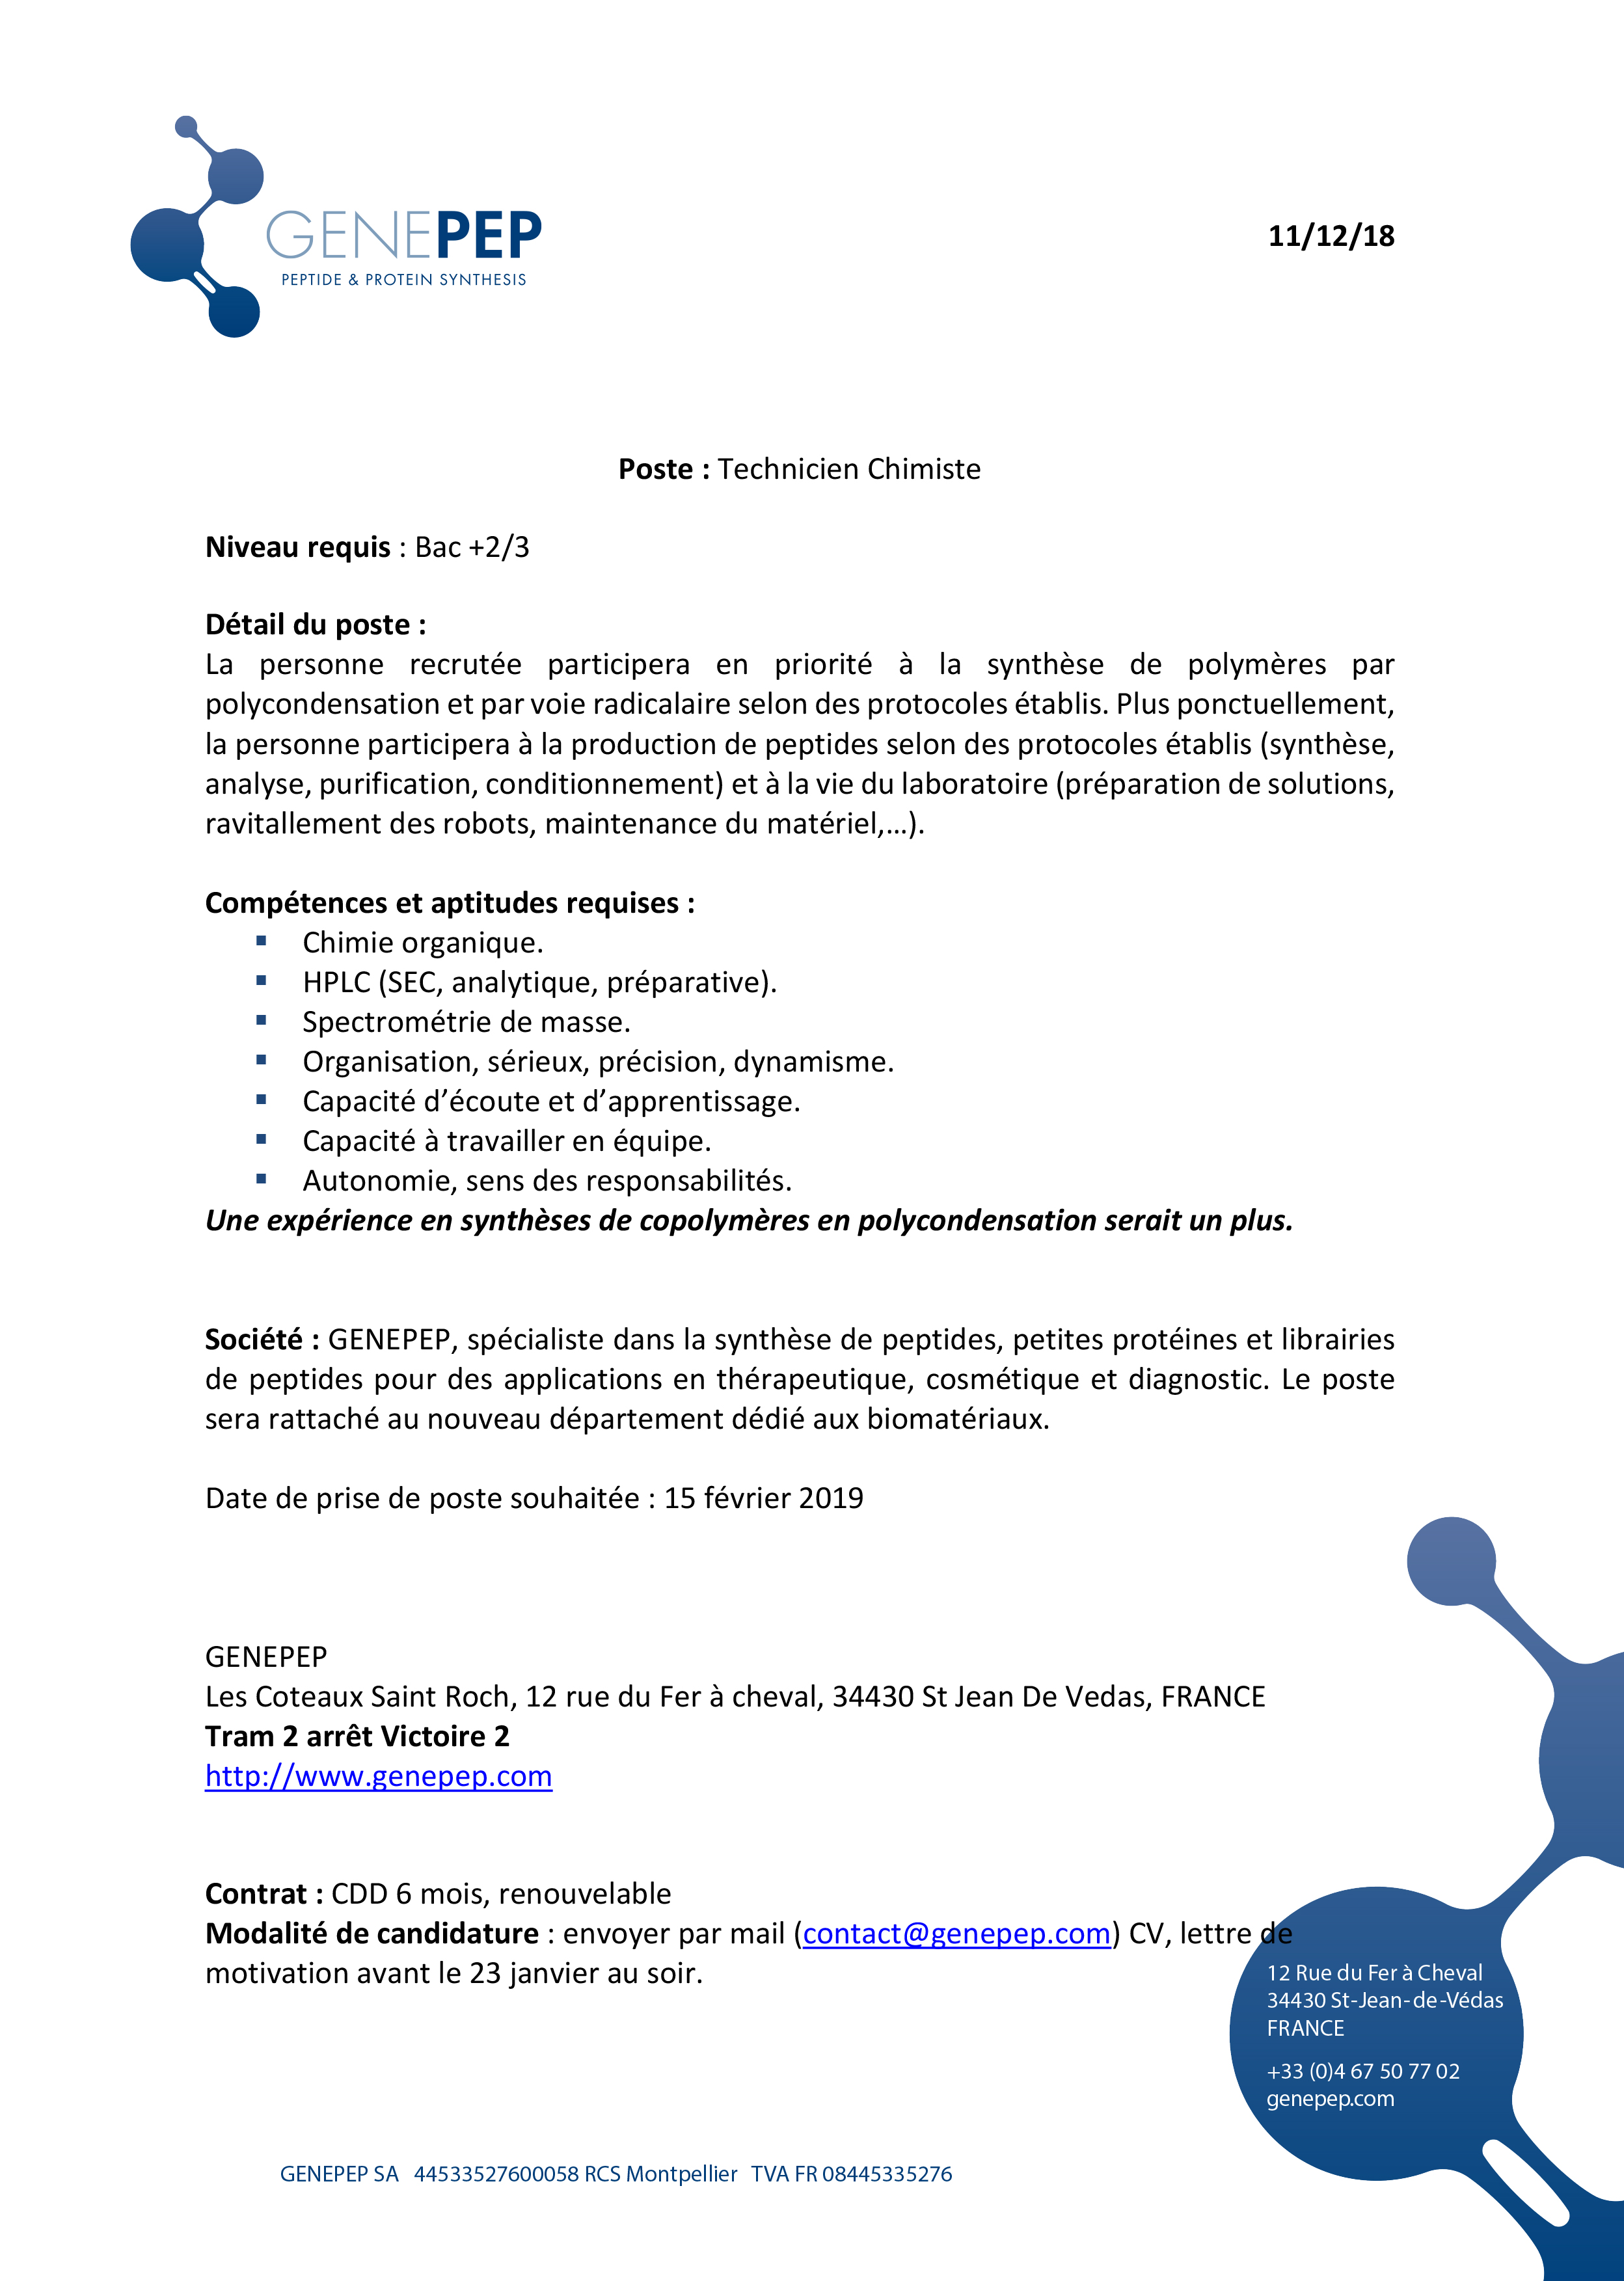 Genepep Job offer